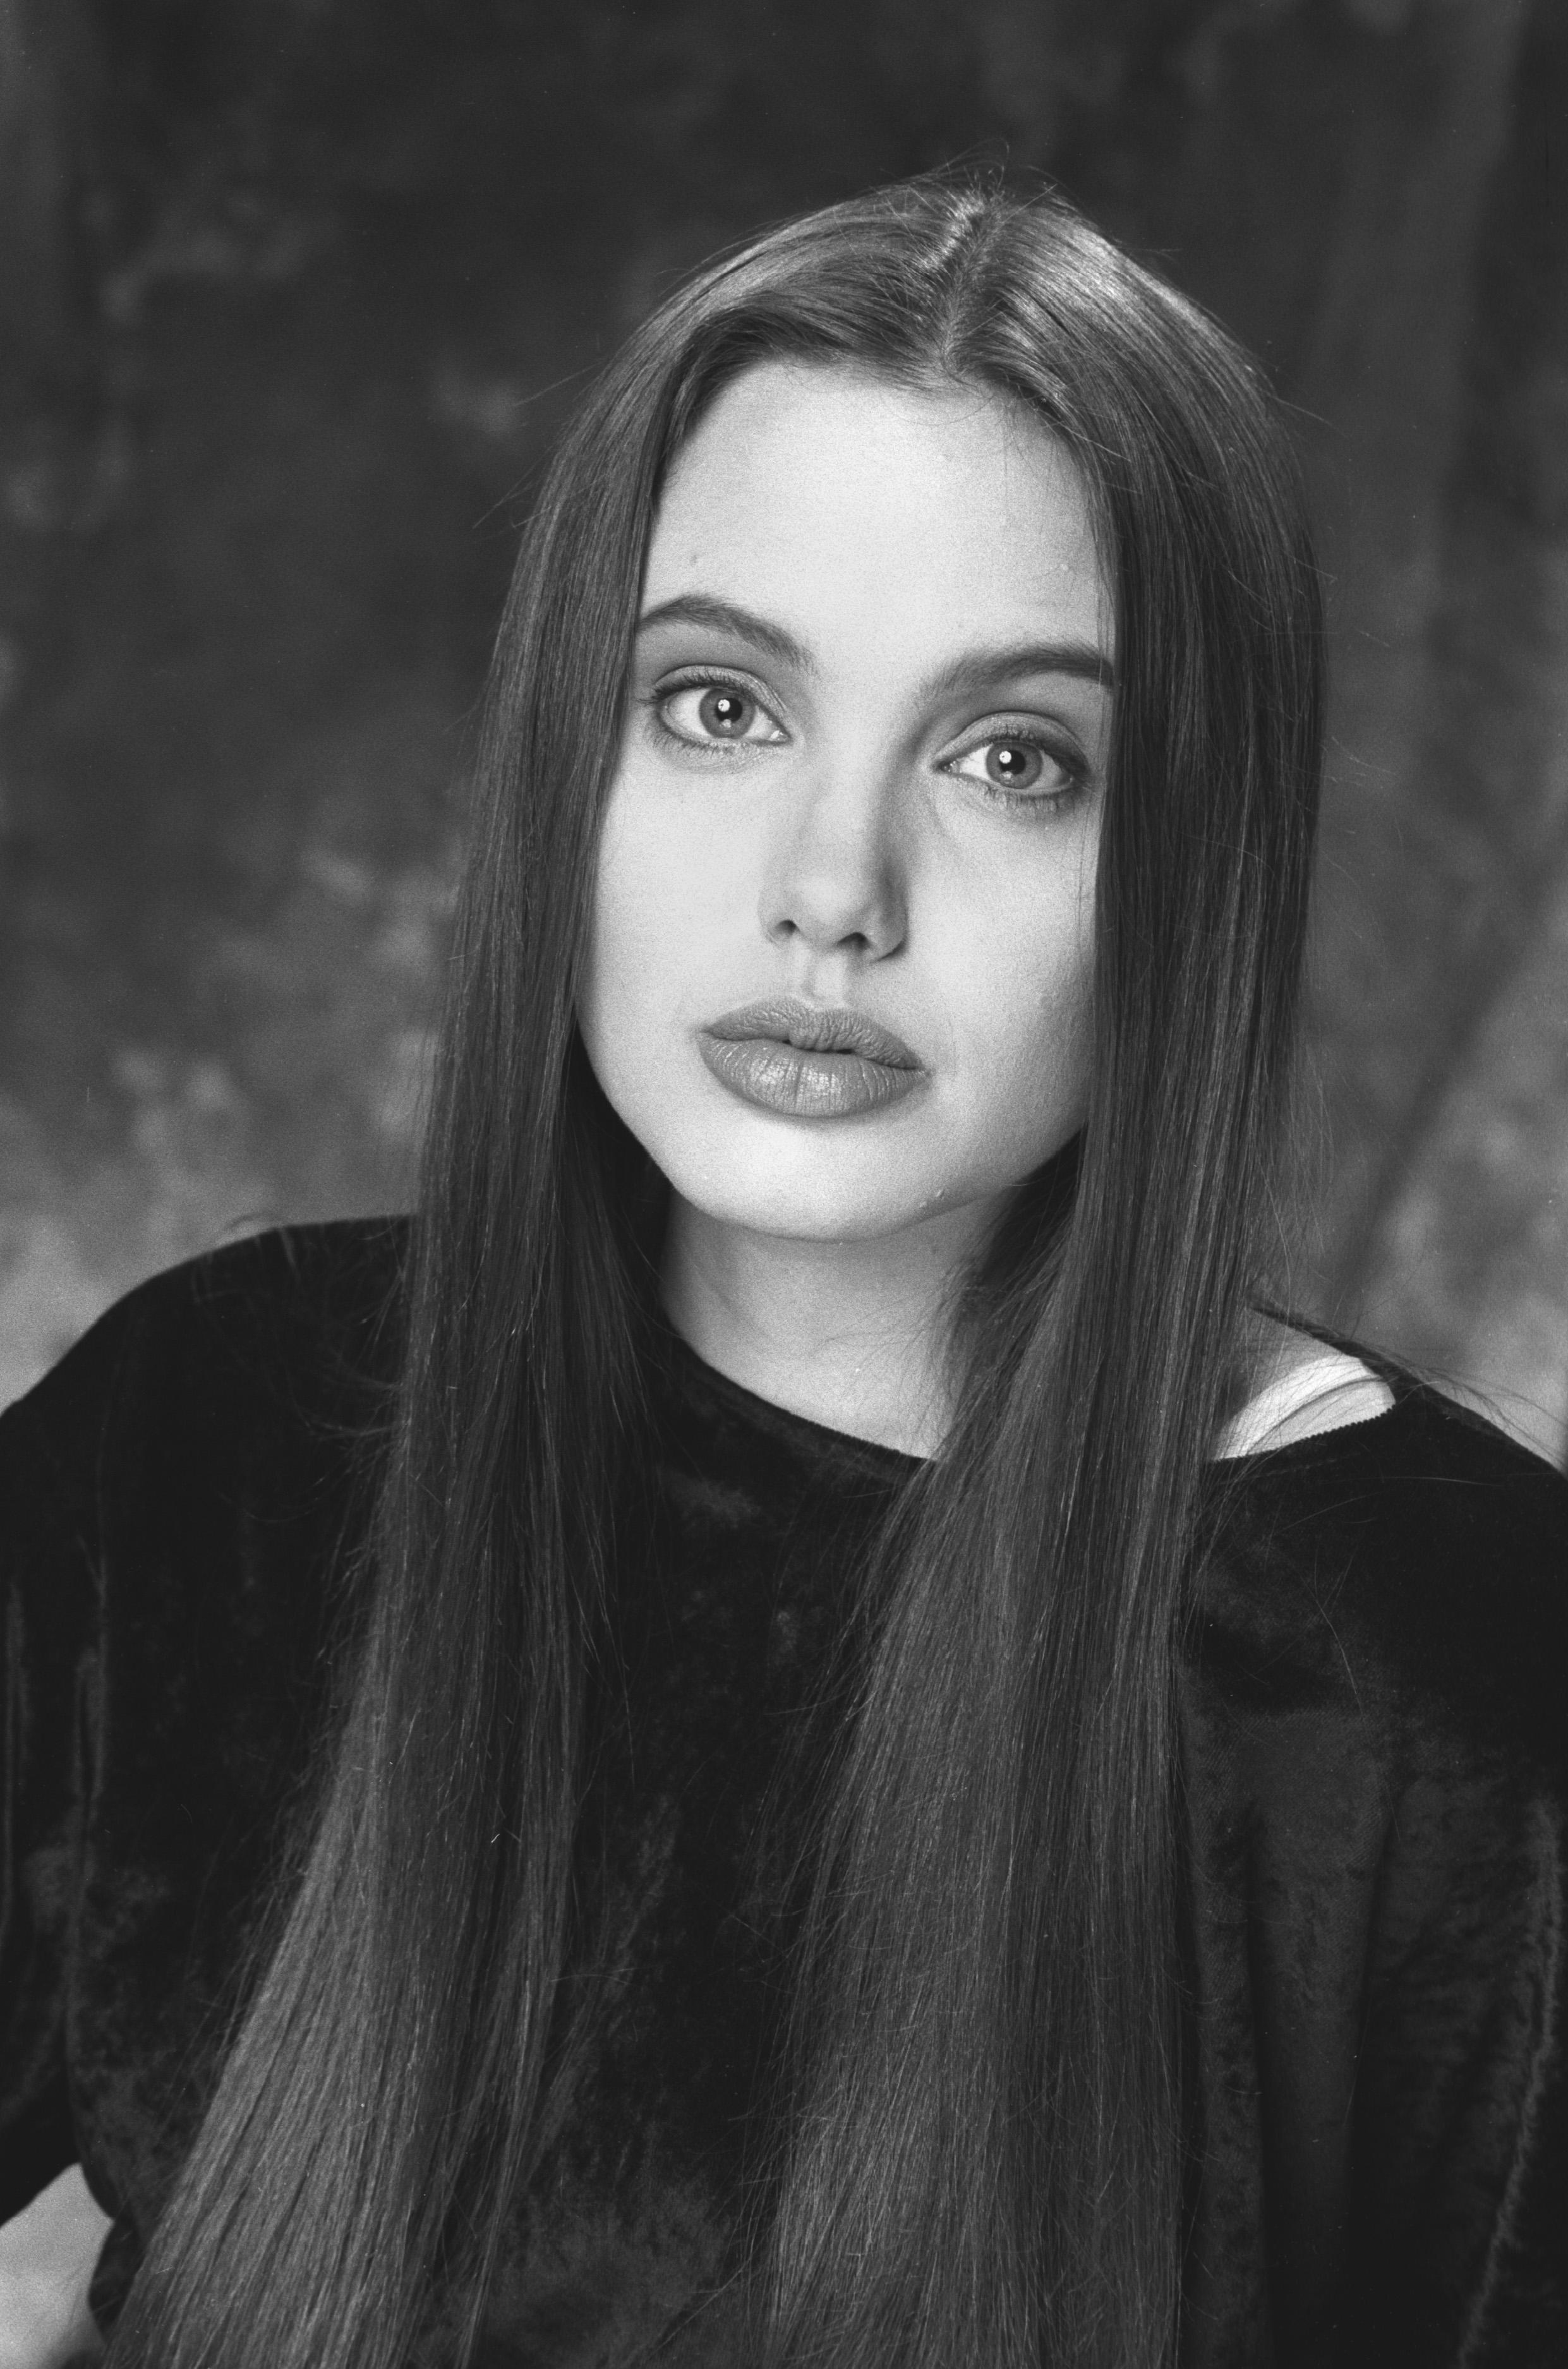 Анджелина Джоли (Angelina Jolie) биография, фото, личная ...